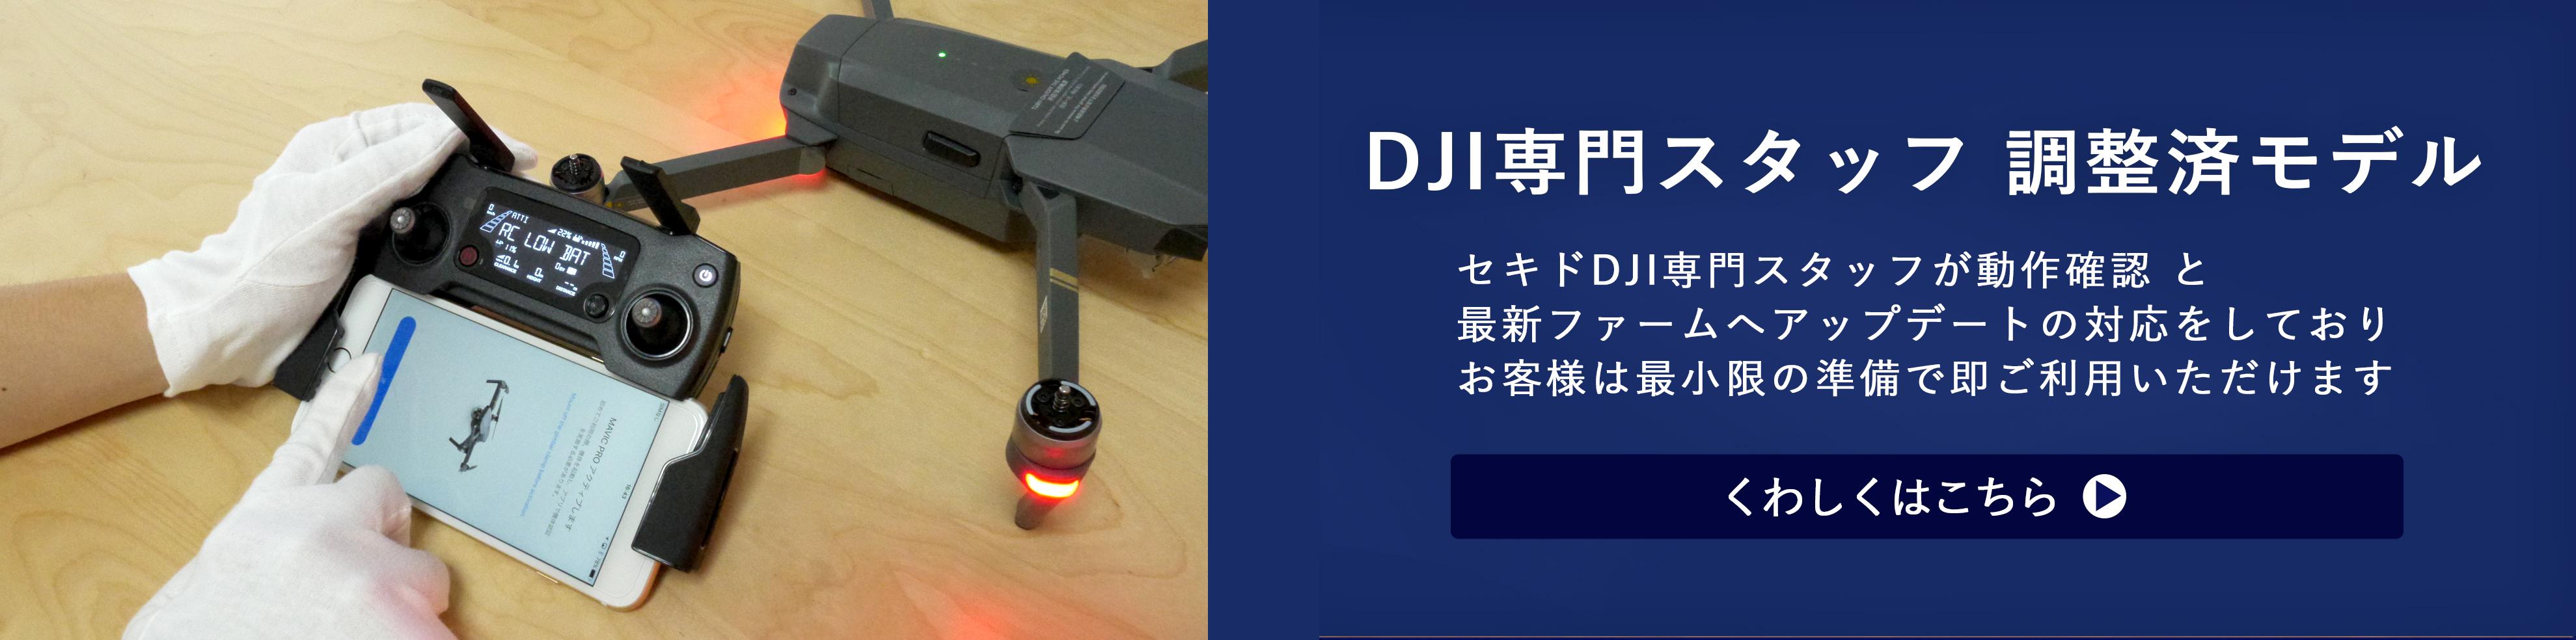 DJI専門スタッフによるMAVIC調整済モデル